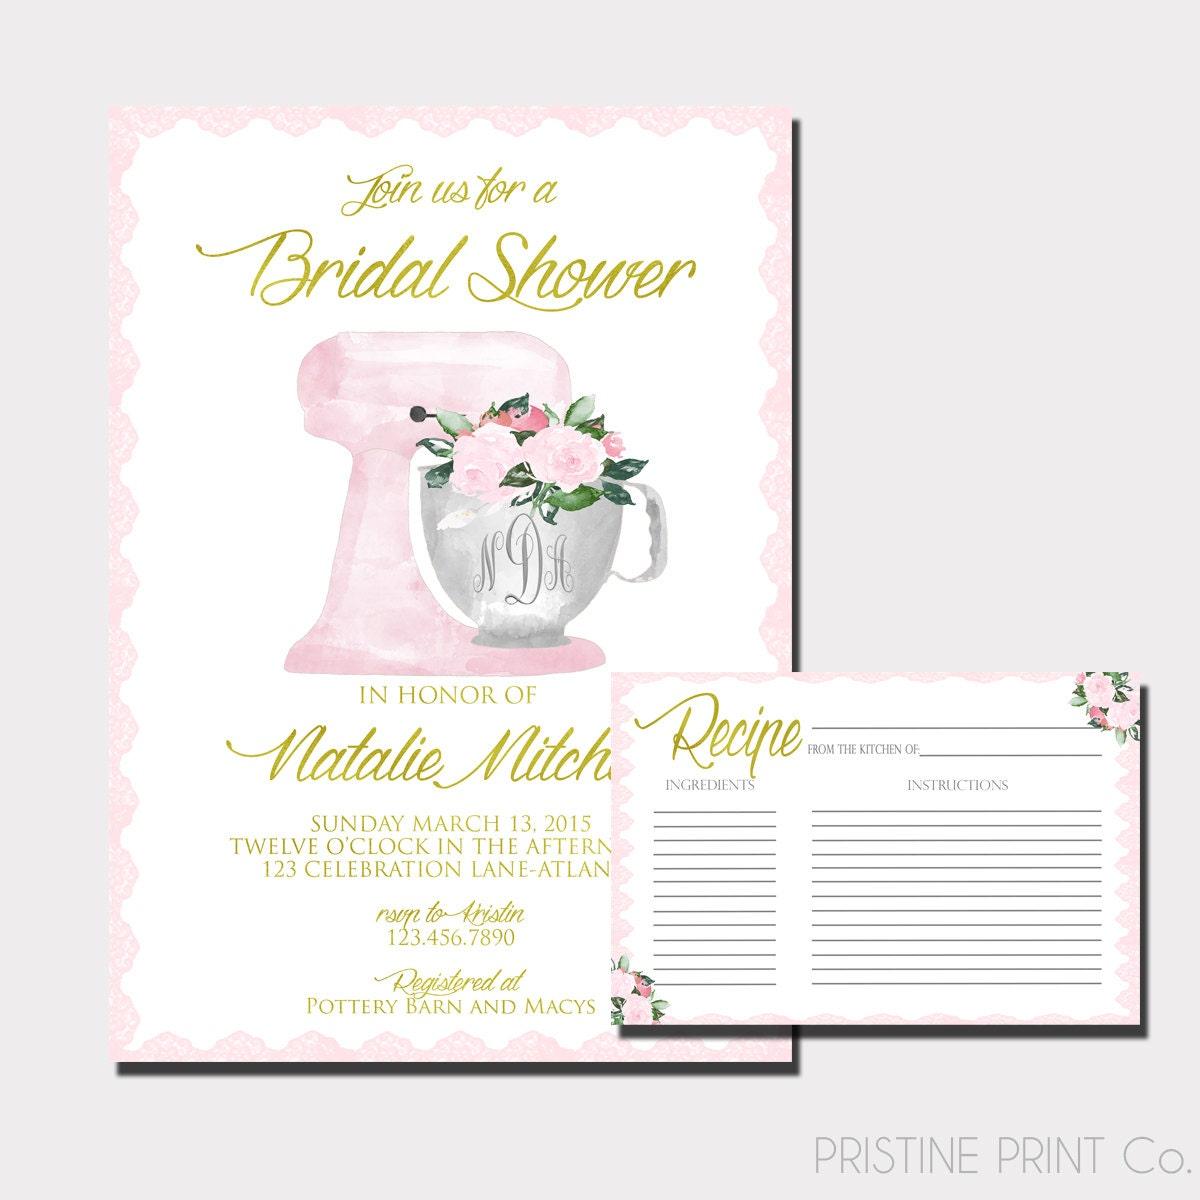 e5fab276cd92 Floral Monogram Bridal Shower Invitation Kitchen Shower